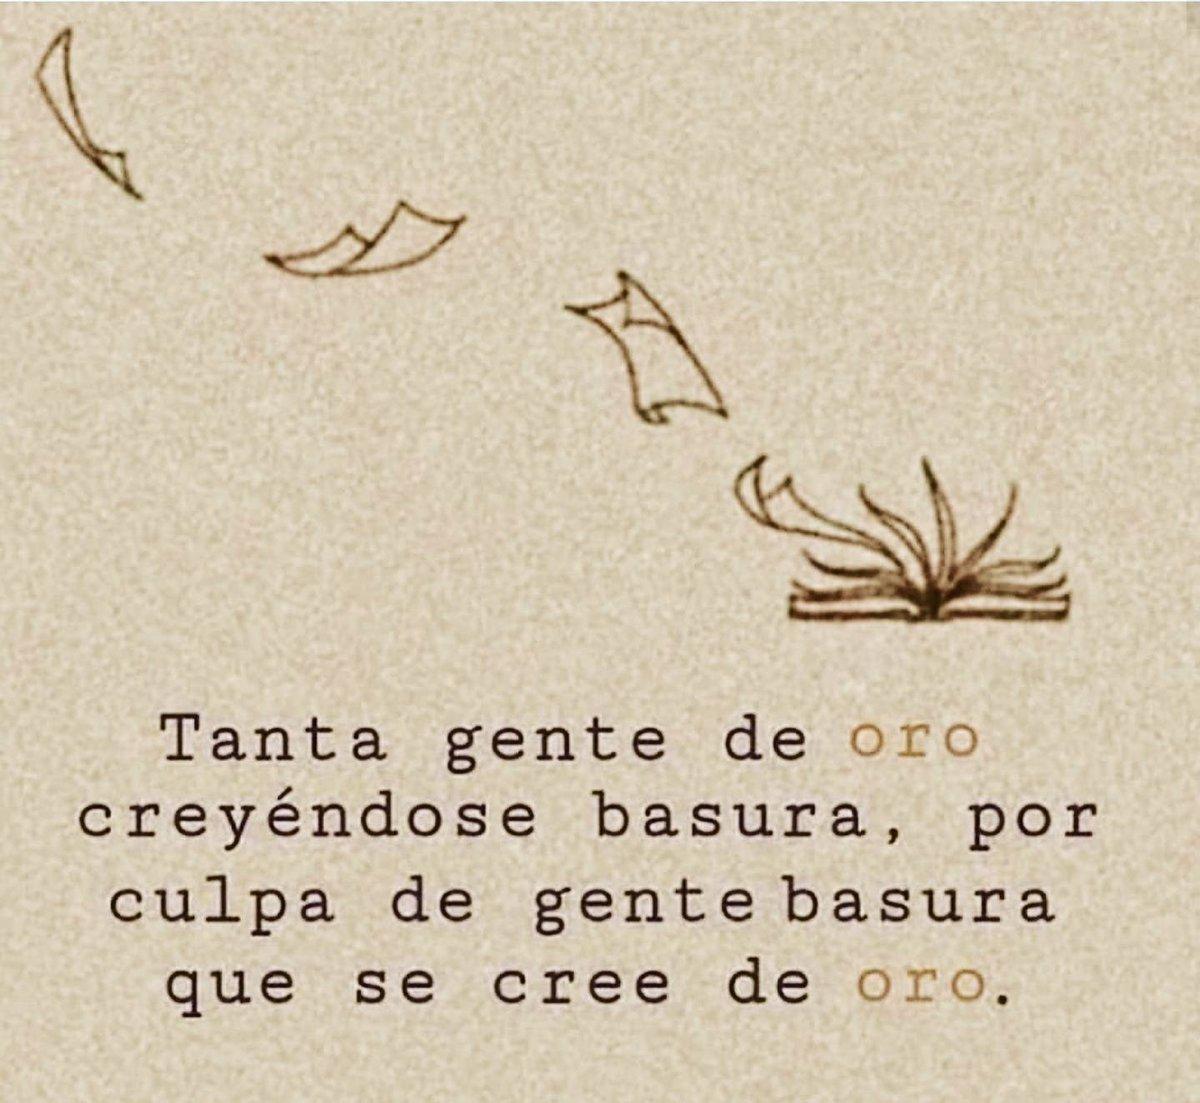 Quijotadas De Amor On Twitter Quijotadasdeamor Tanta Gente